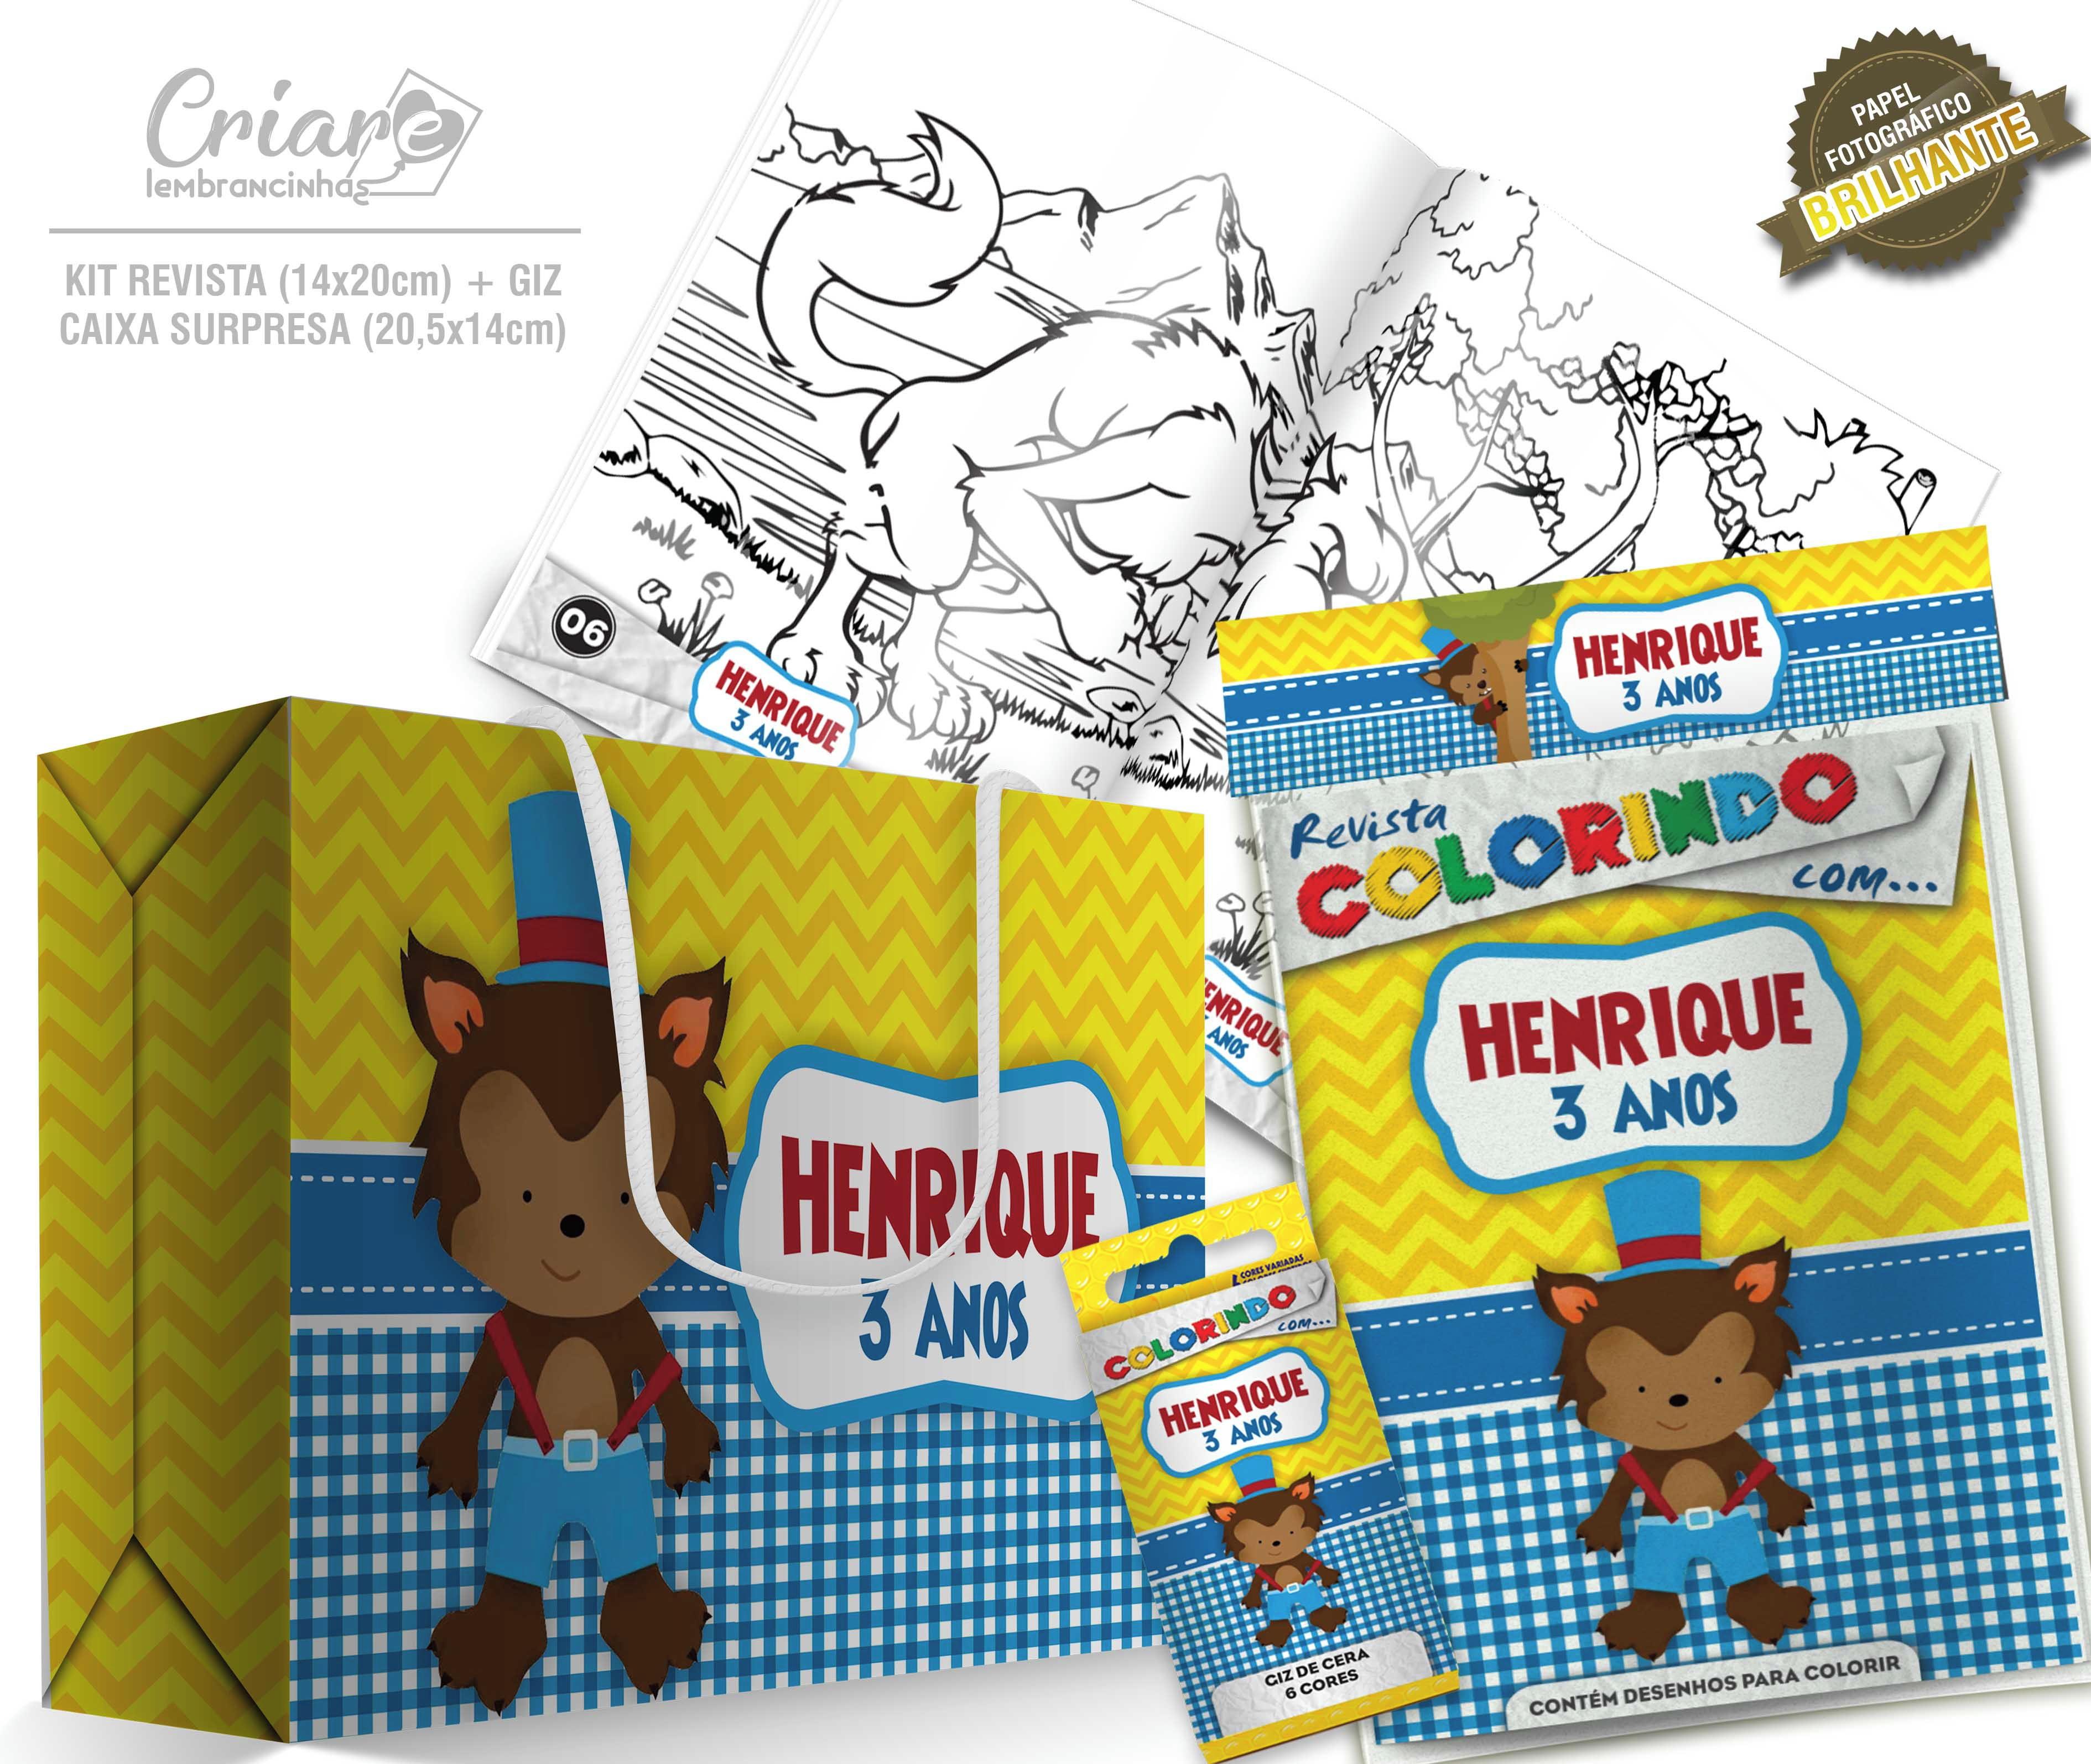 Caixa Surpresa Kit De Colorir Lobo Mau No Elo7 Criare